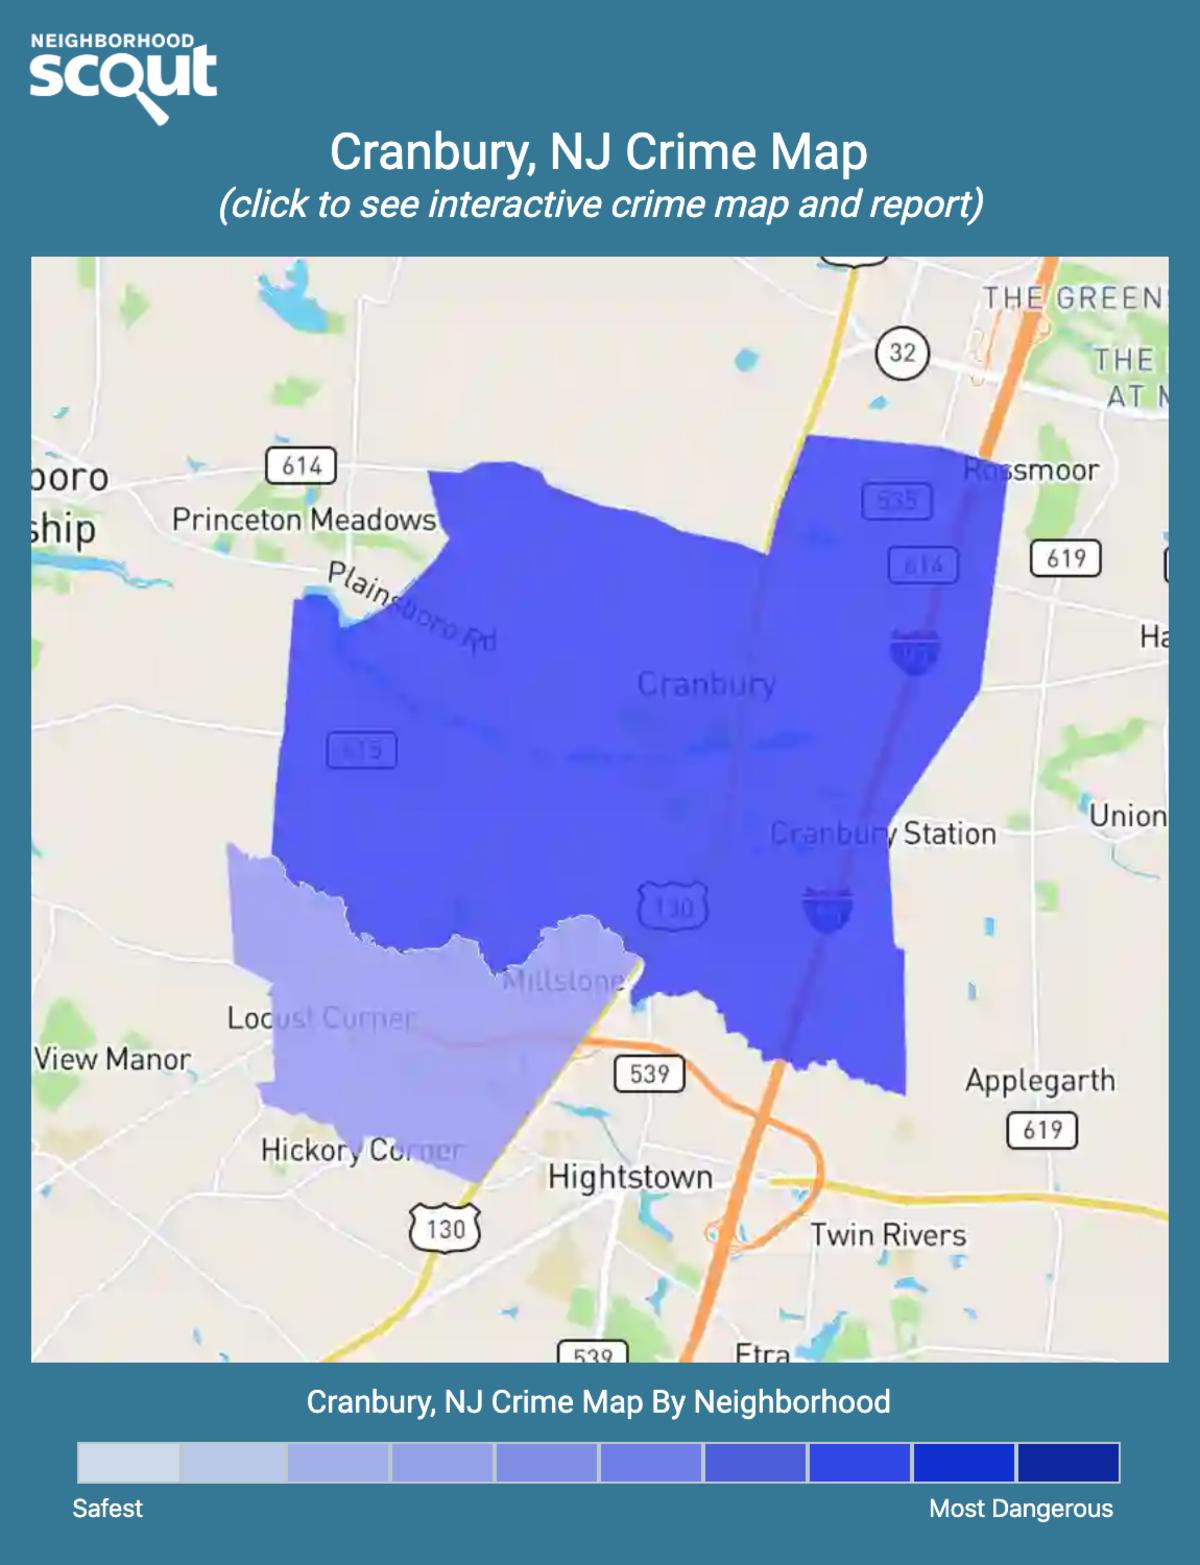 Cranbury, New Jersey crime map